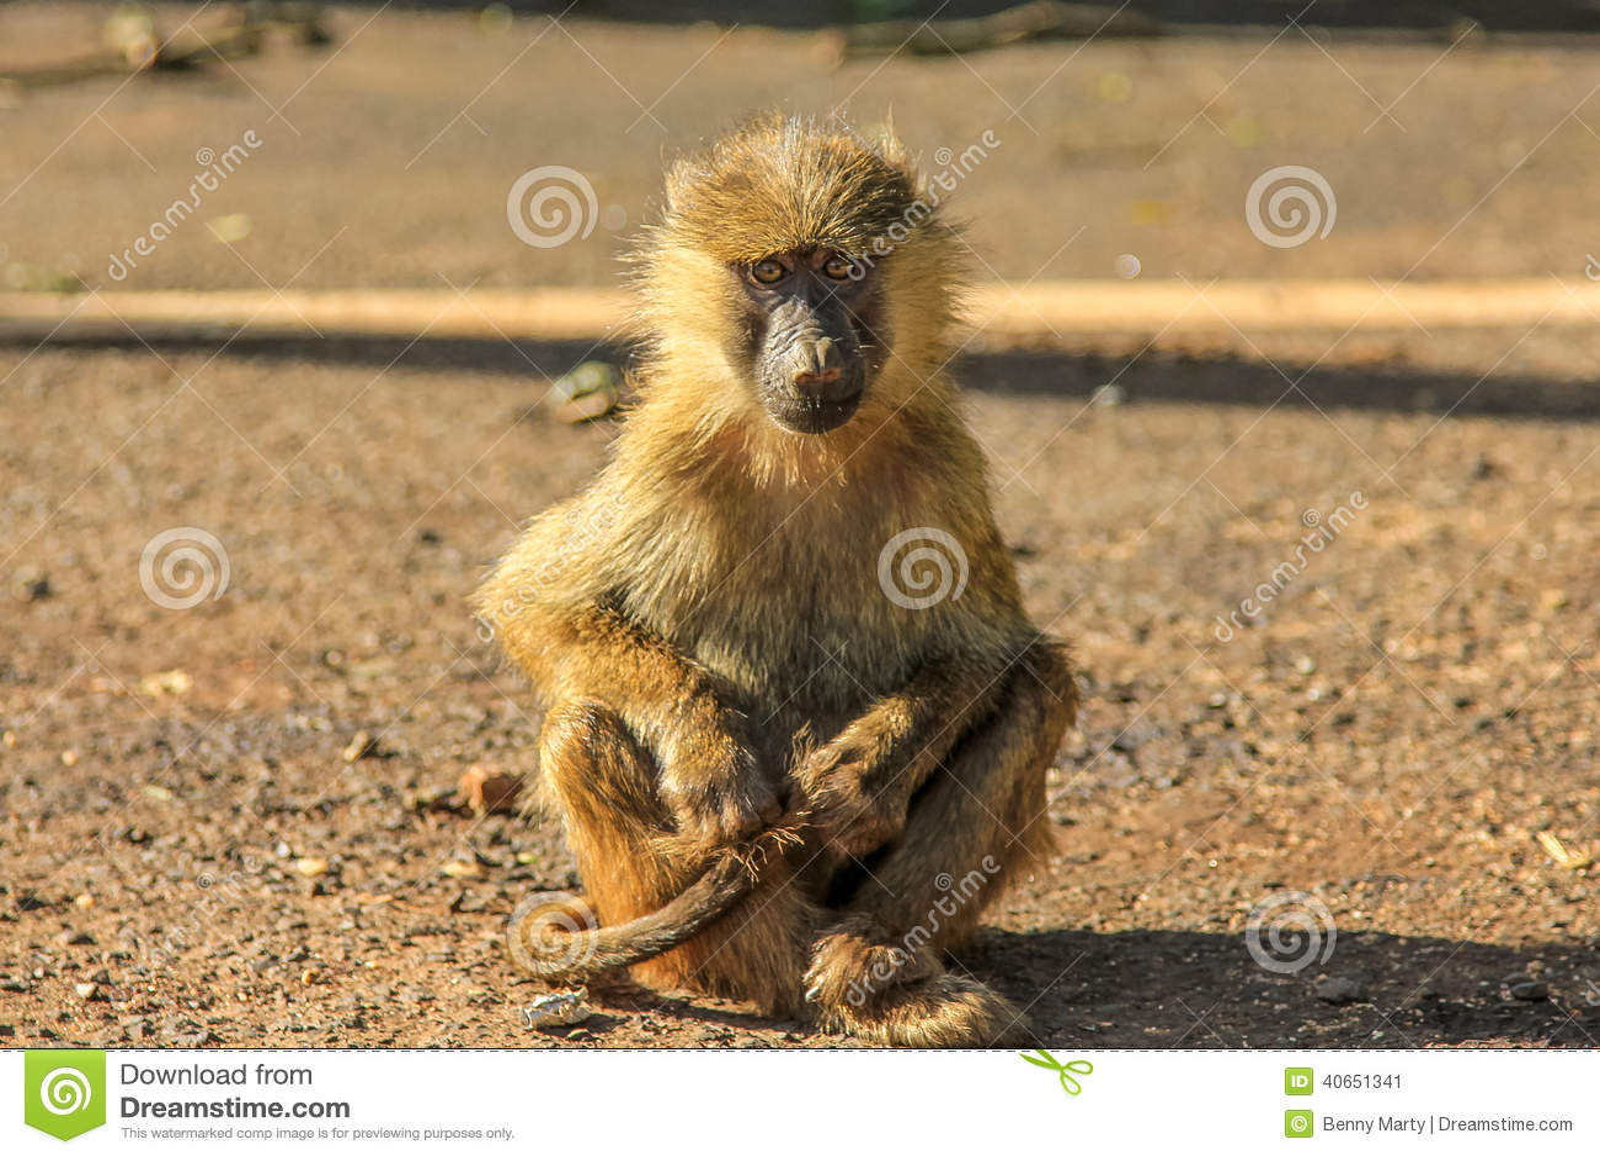 Baboon sitting